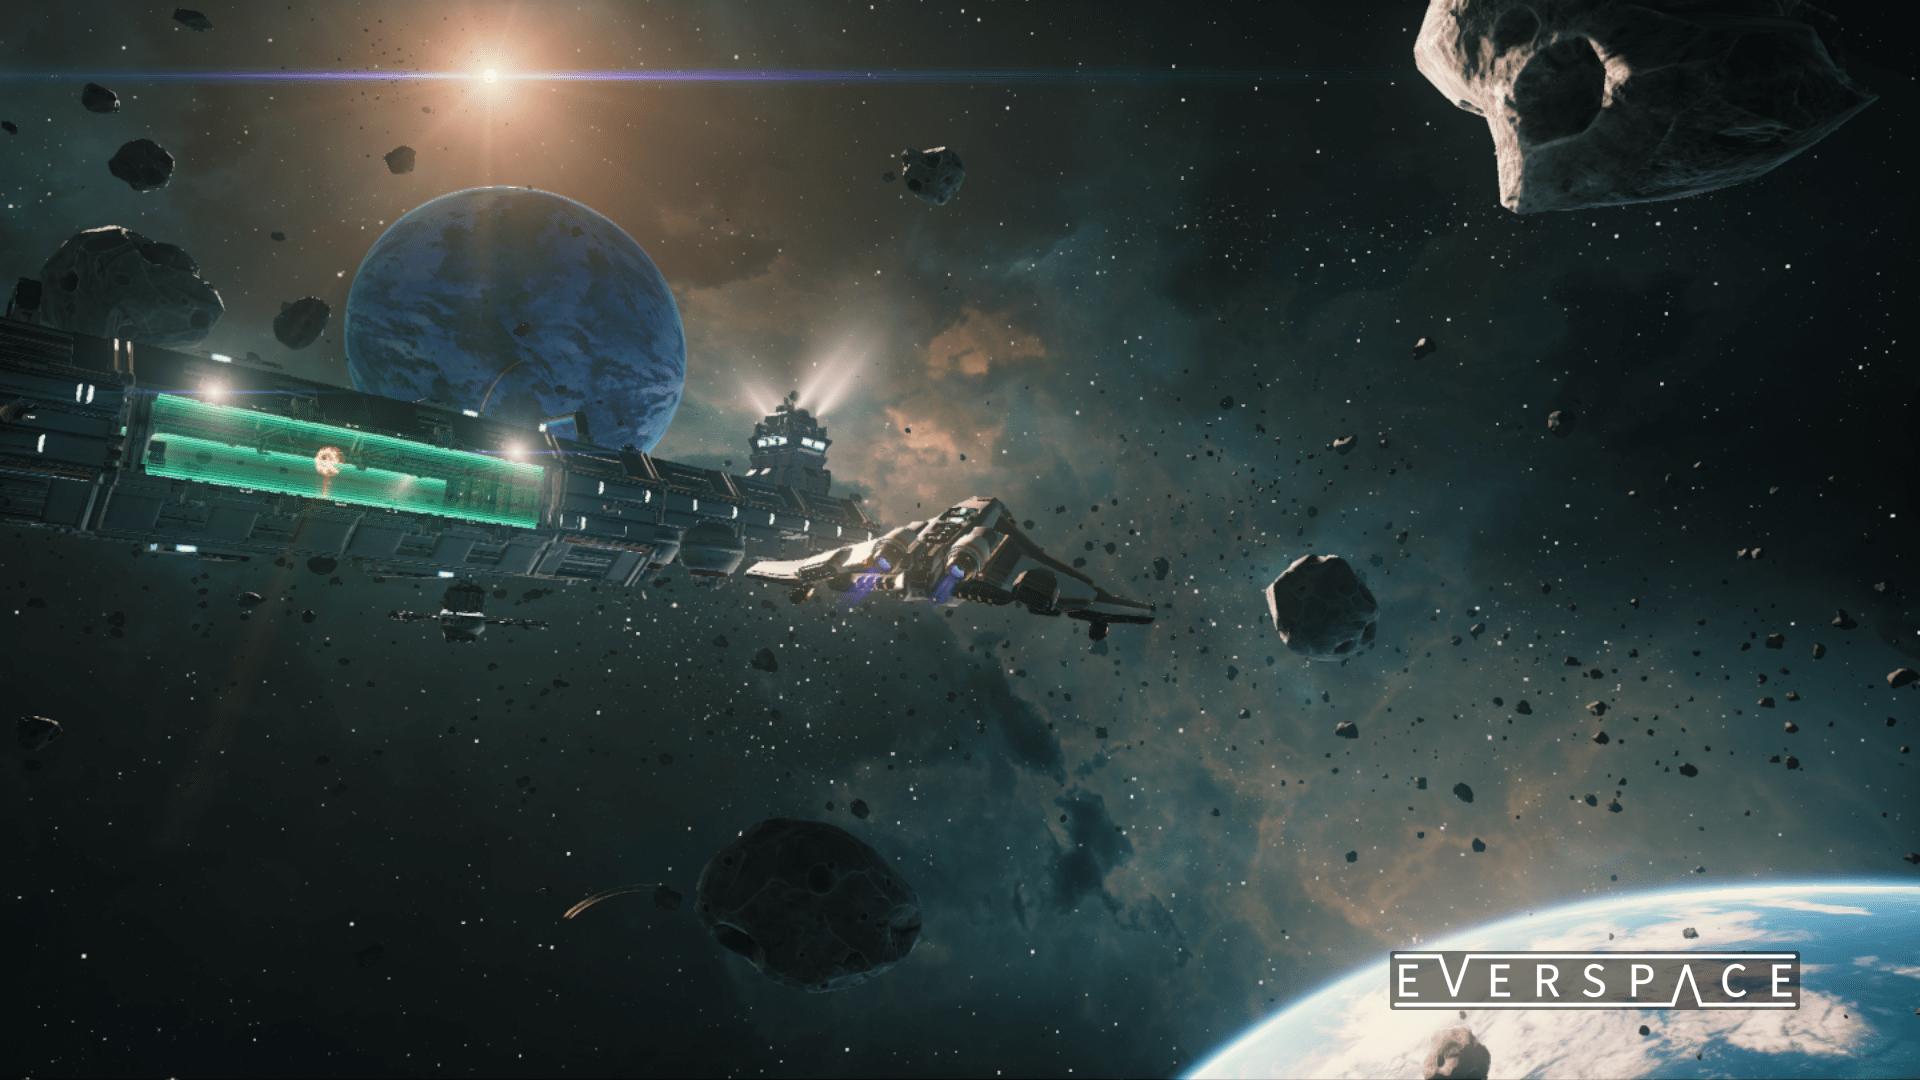 Everspace Screenhot 3